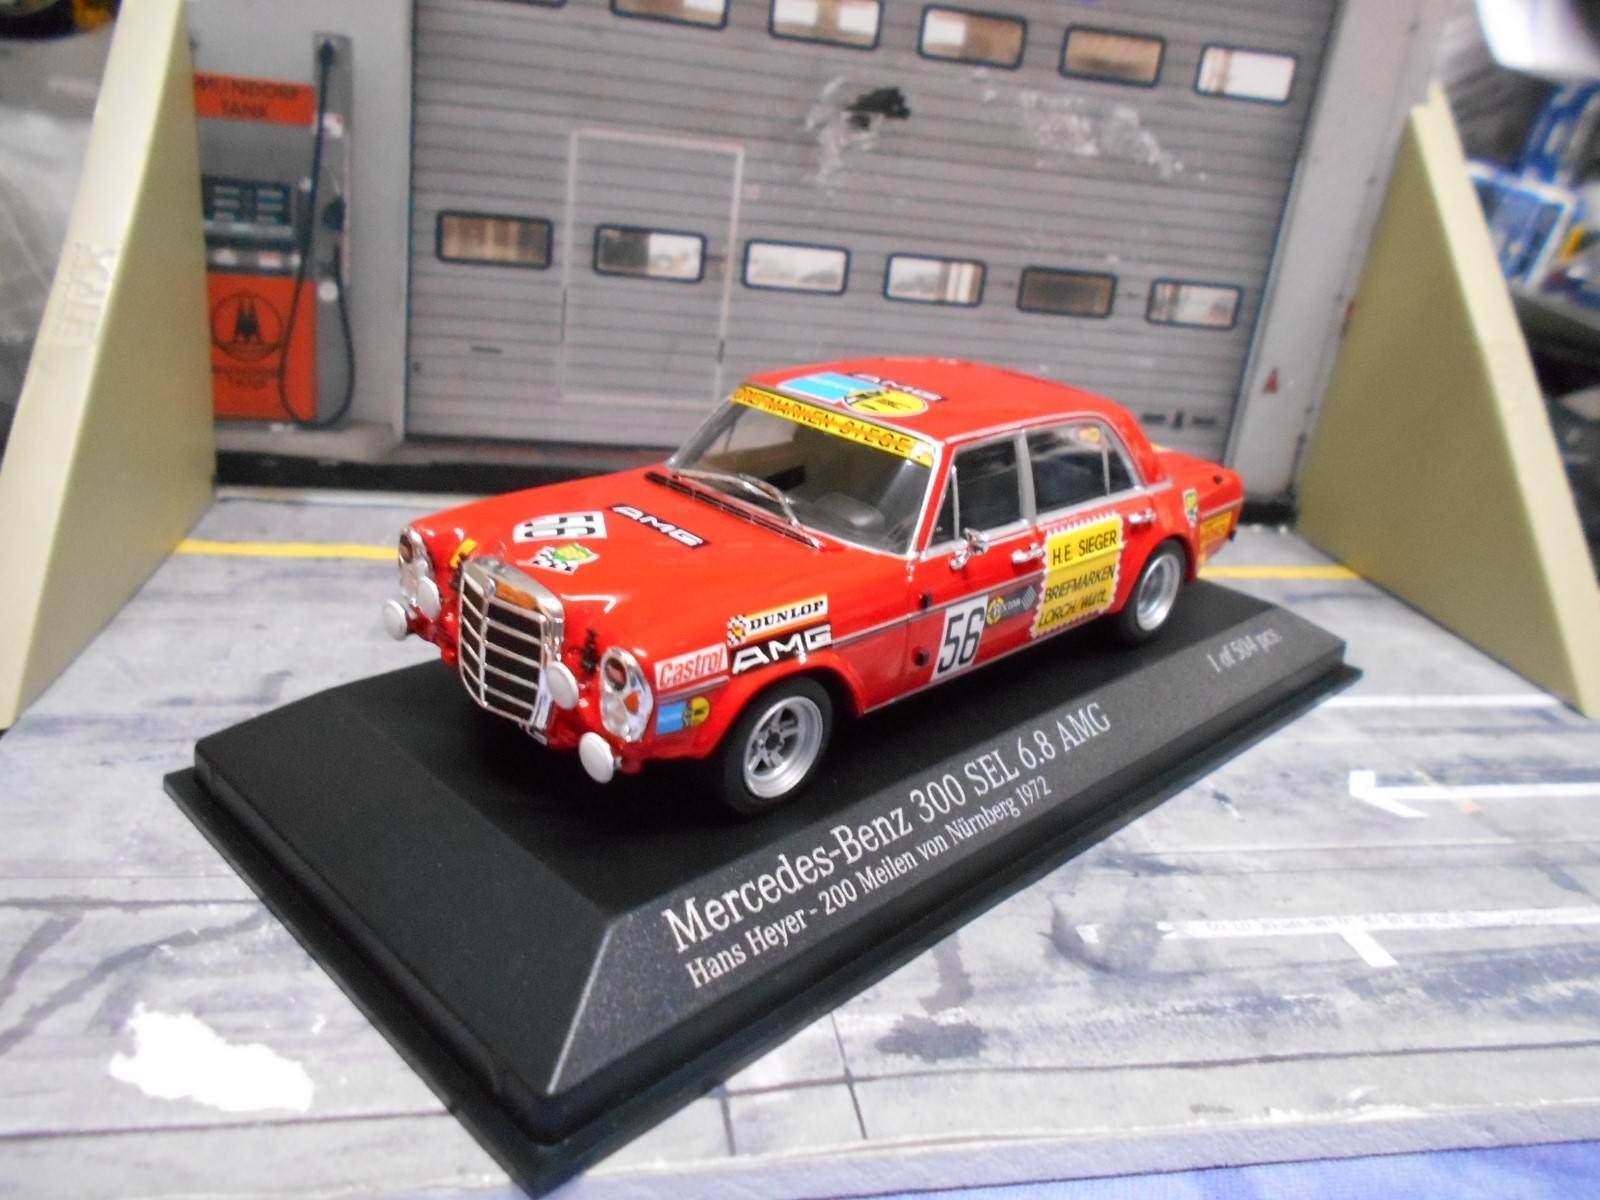 Sconto del 40% MERCEDES Benz 300 SEL SEL SEL 6.8 AMG DRM Norisring 1972  56 Heyer Minichamps 1 43  solo per te